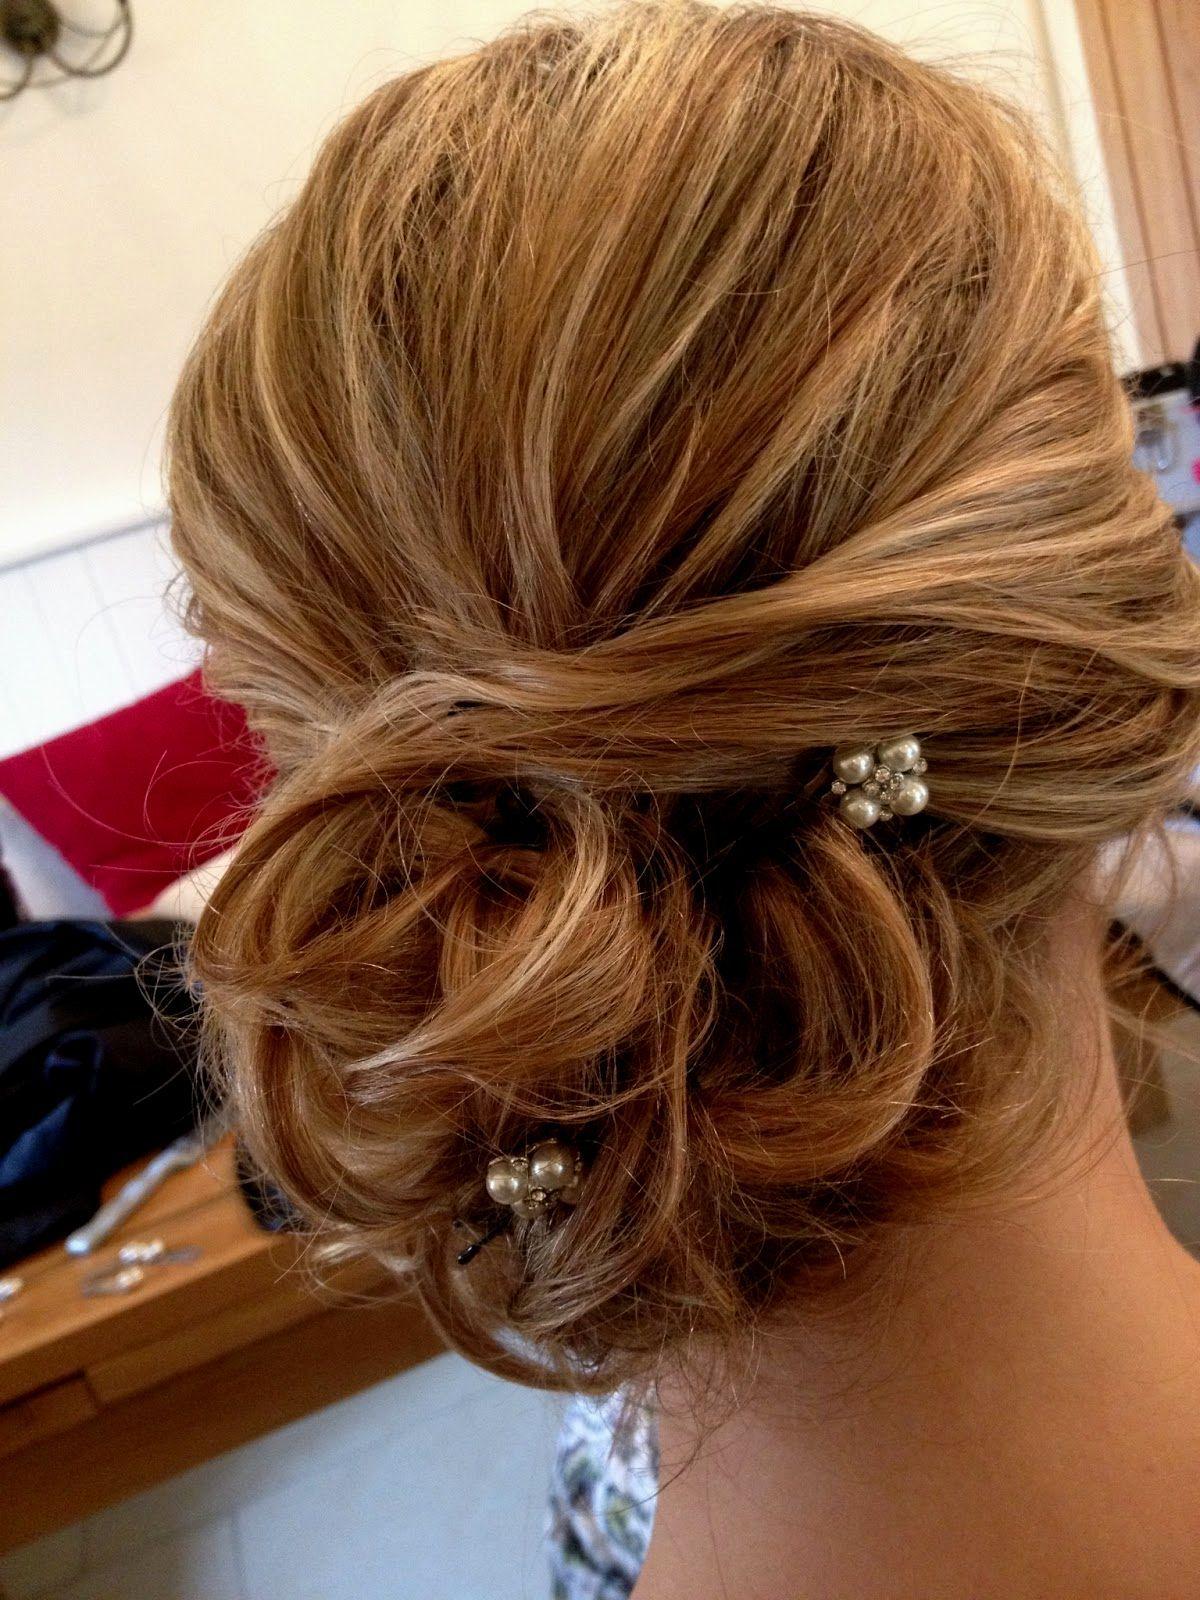 bridesmaid hairstyles low side bun | anna's wedding in 2019